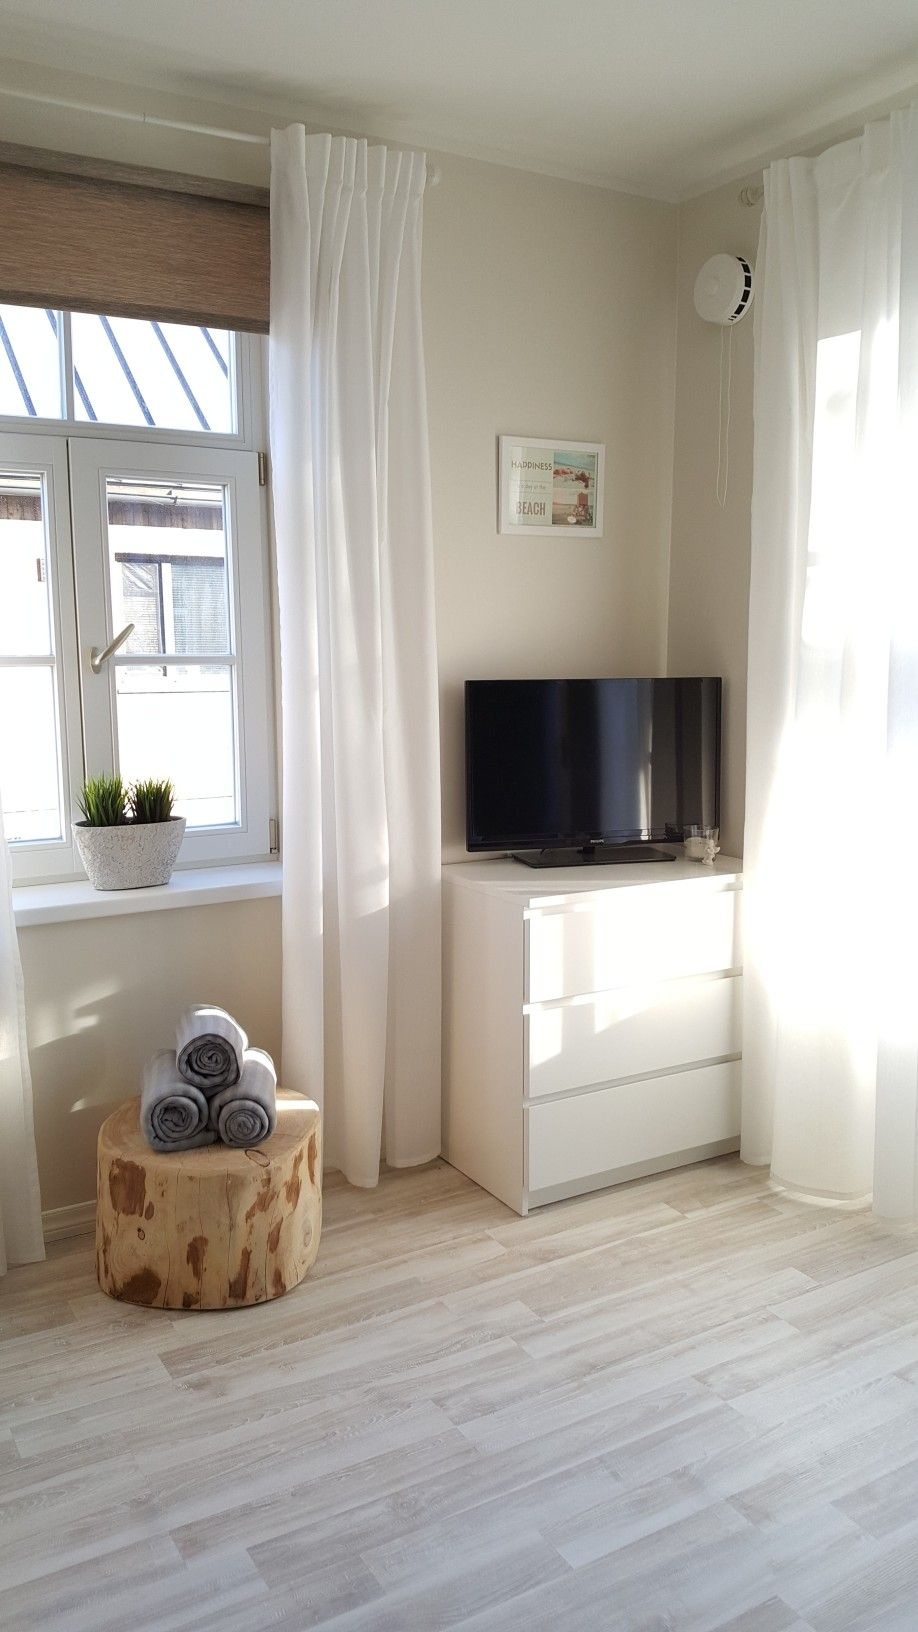 Livingroom Decor Kitchen Decor Skandinavian Style Family And